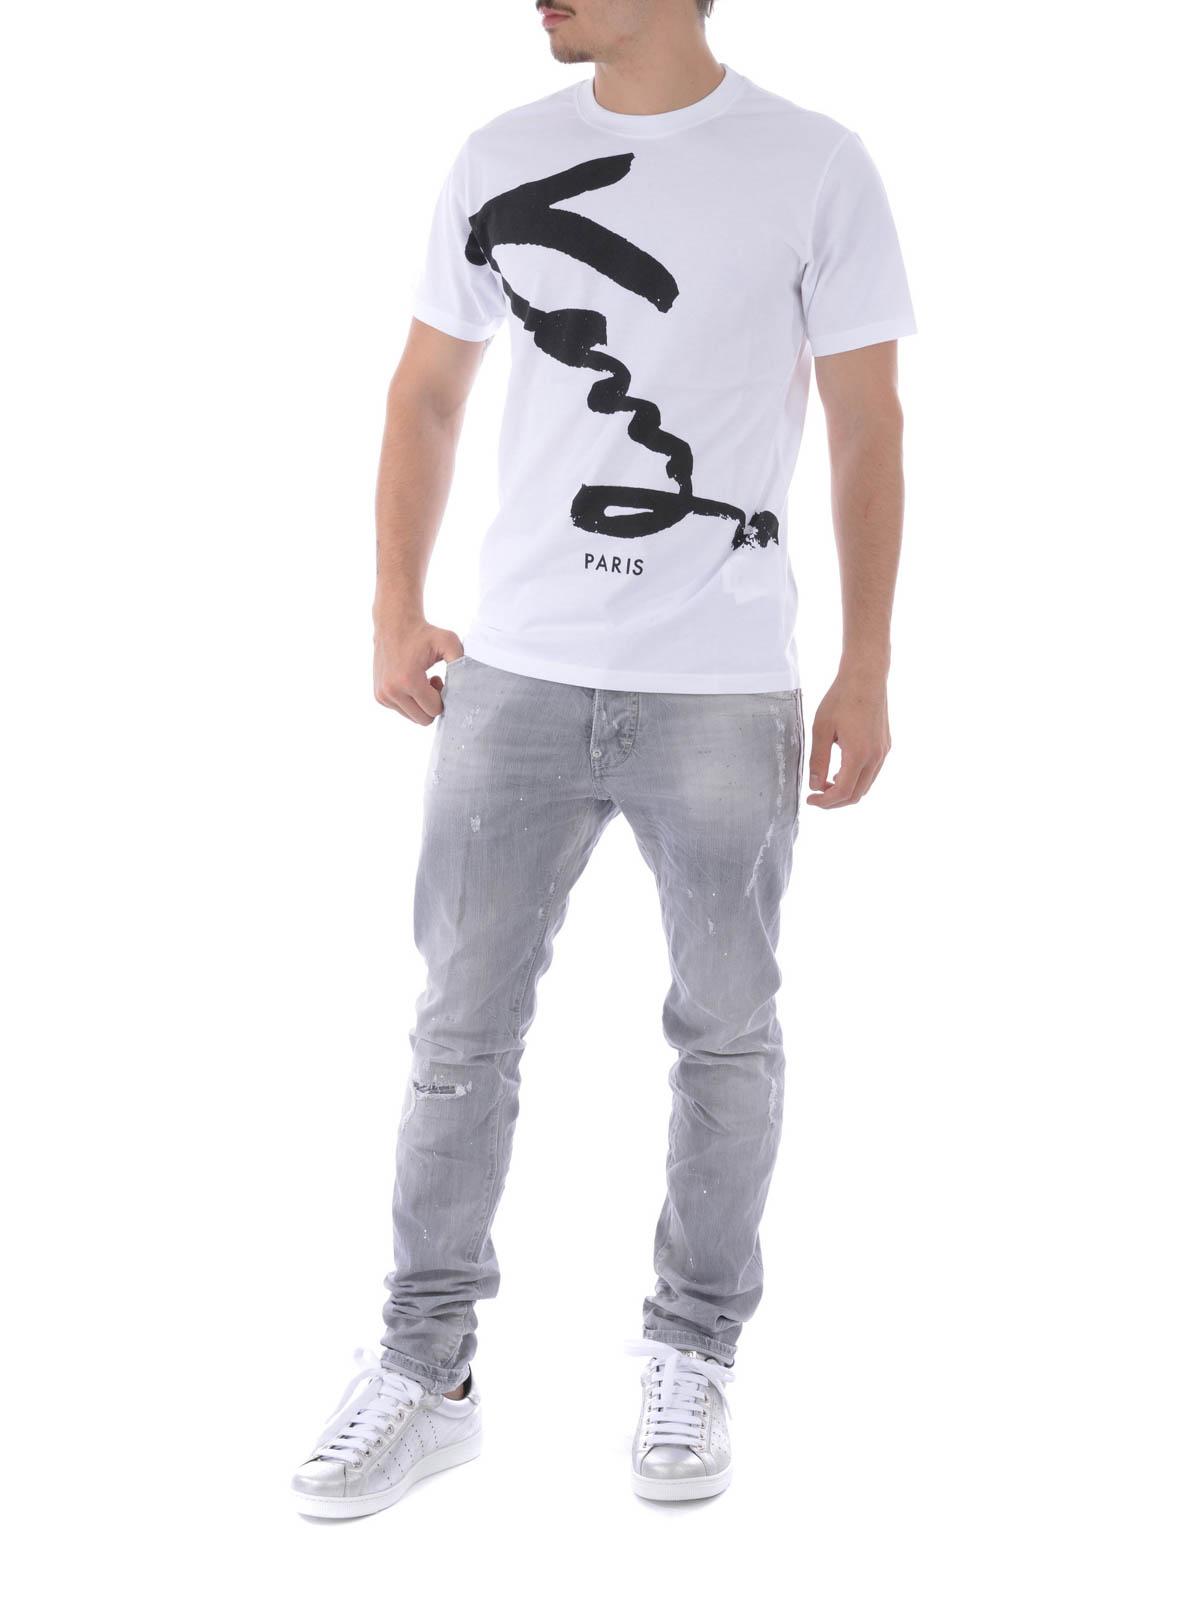 kenzo signature t shirt in single jersey t shirts f665ts0184sc01. Black Bedroom Furniture Sets. Home Design Ideas